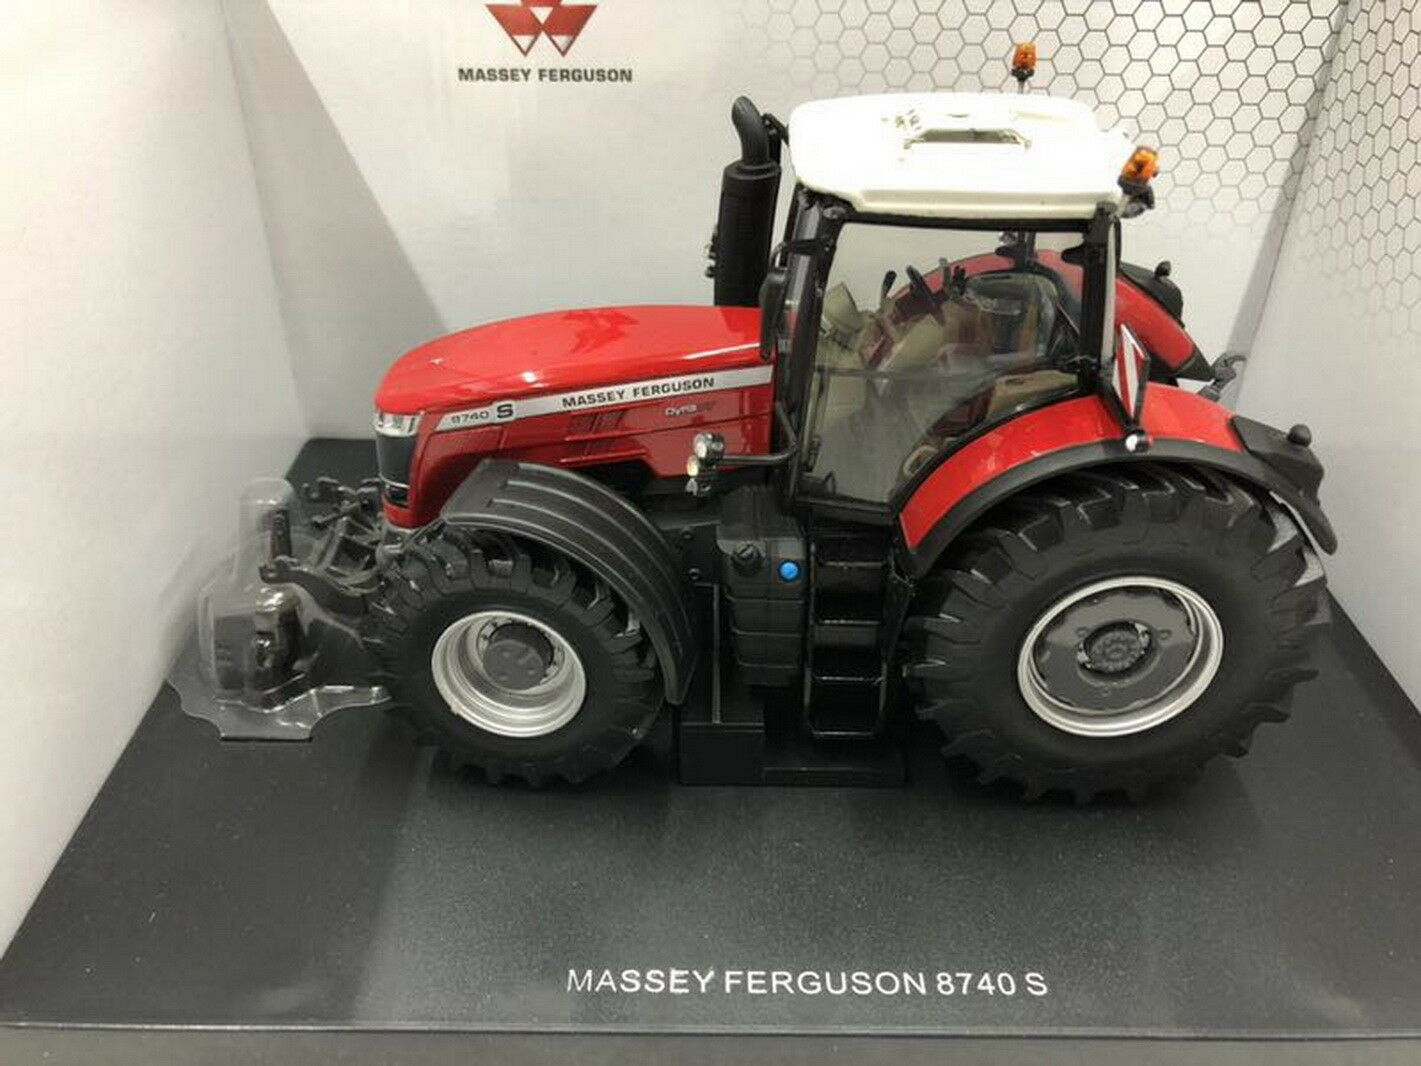 UNIVERSAL HOBBIES 1 32 Massey Ferguson 8740 S Diecast Model UH5293